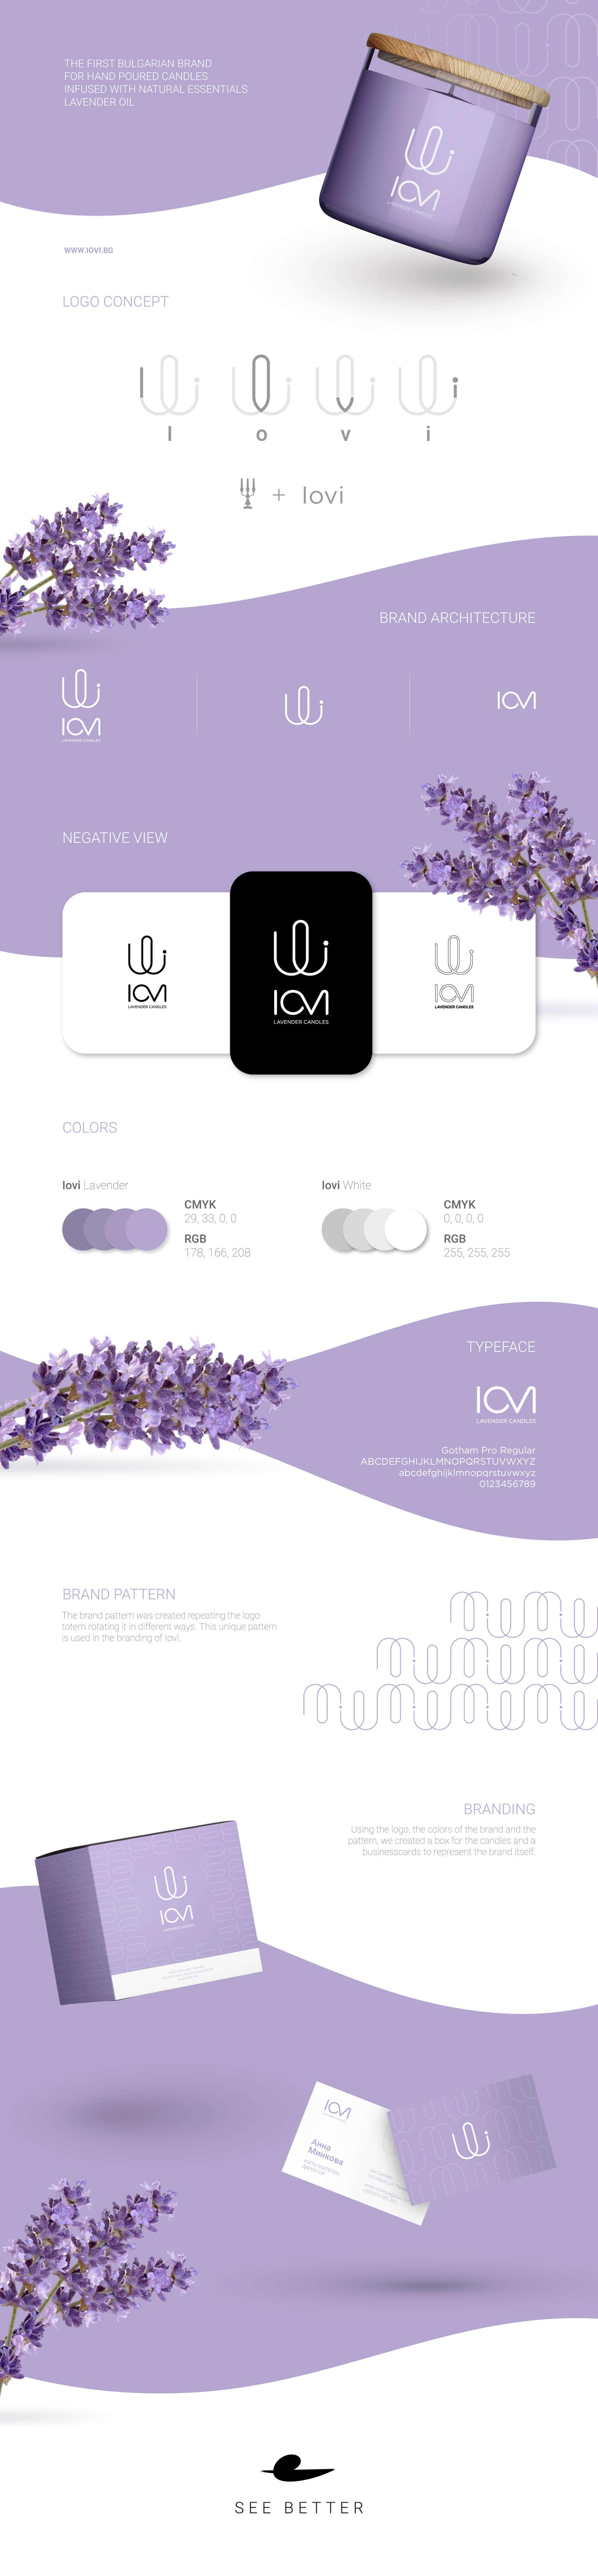 iovi_website_new